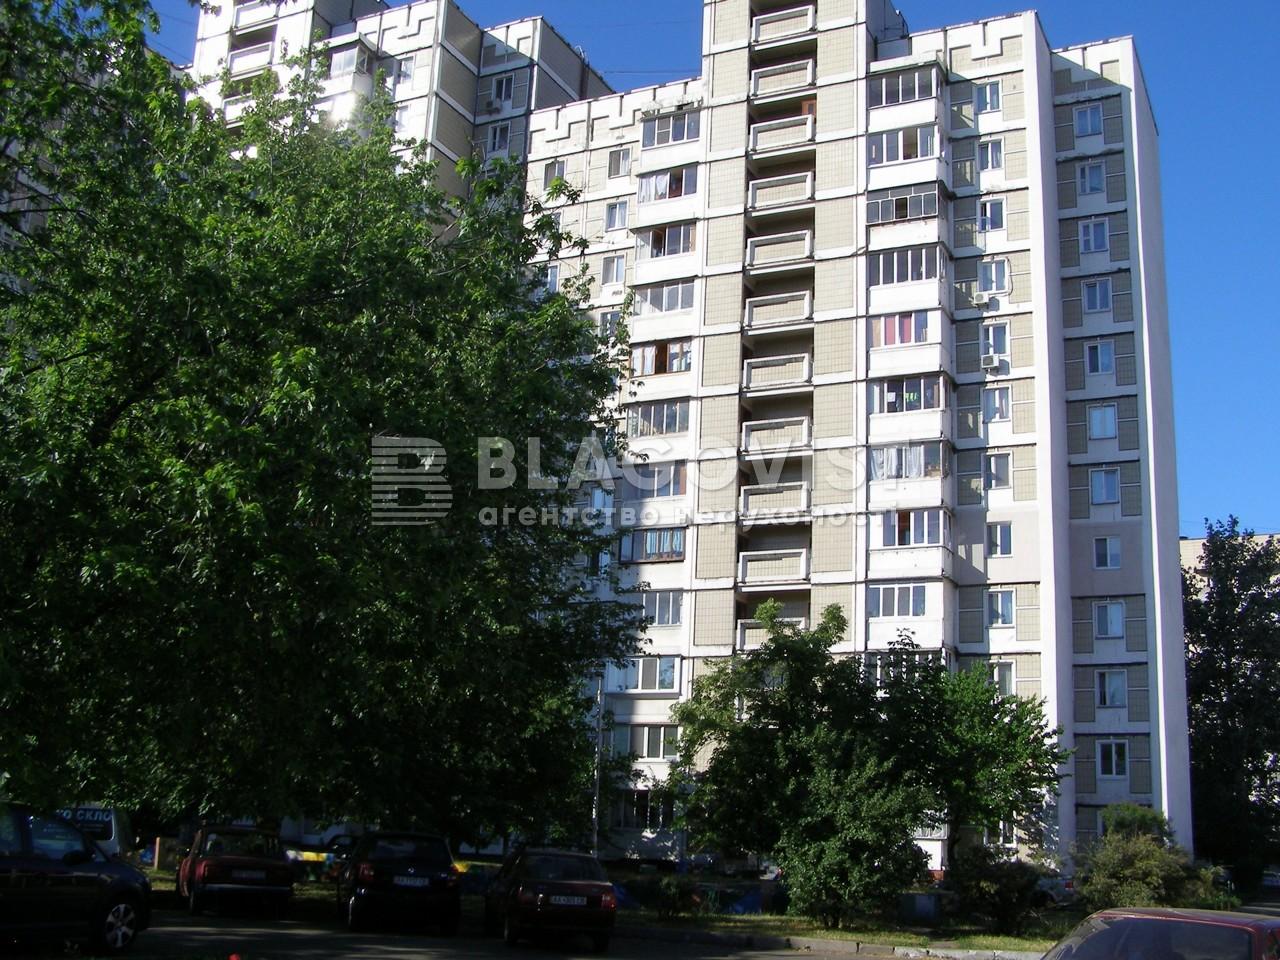 Квартира C-100268, Харьковское шоссе, 170, Киев - Фото 1